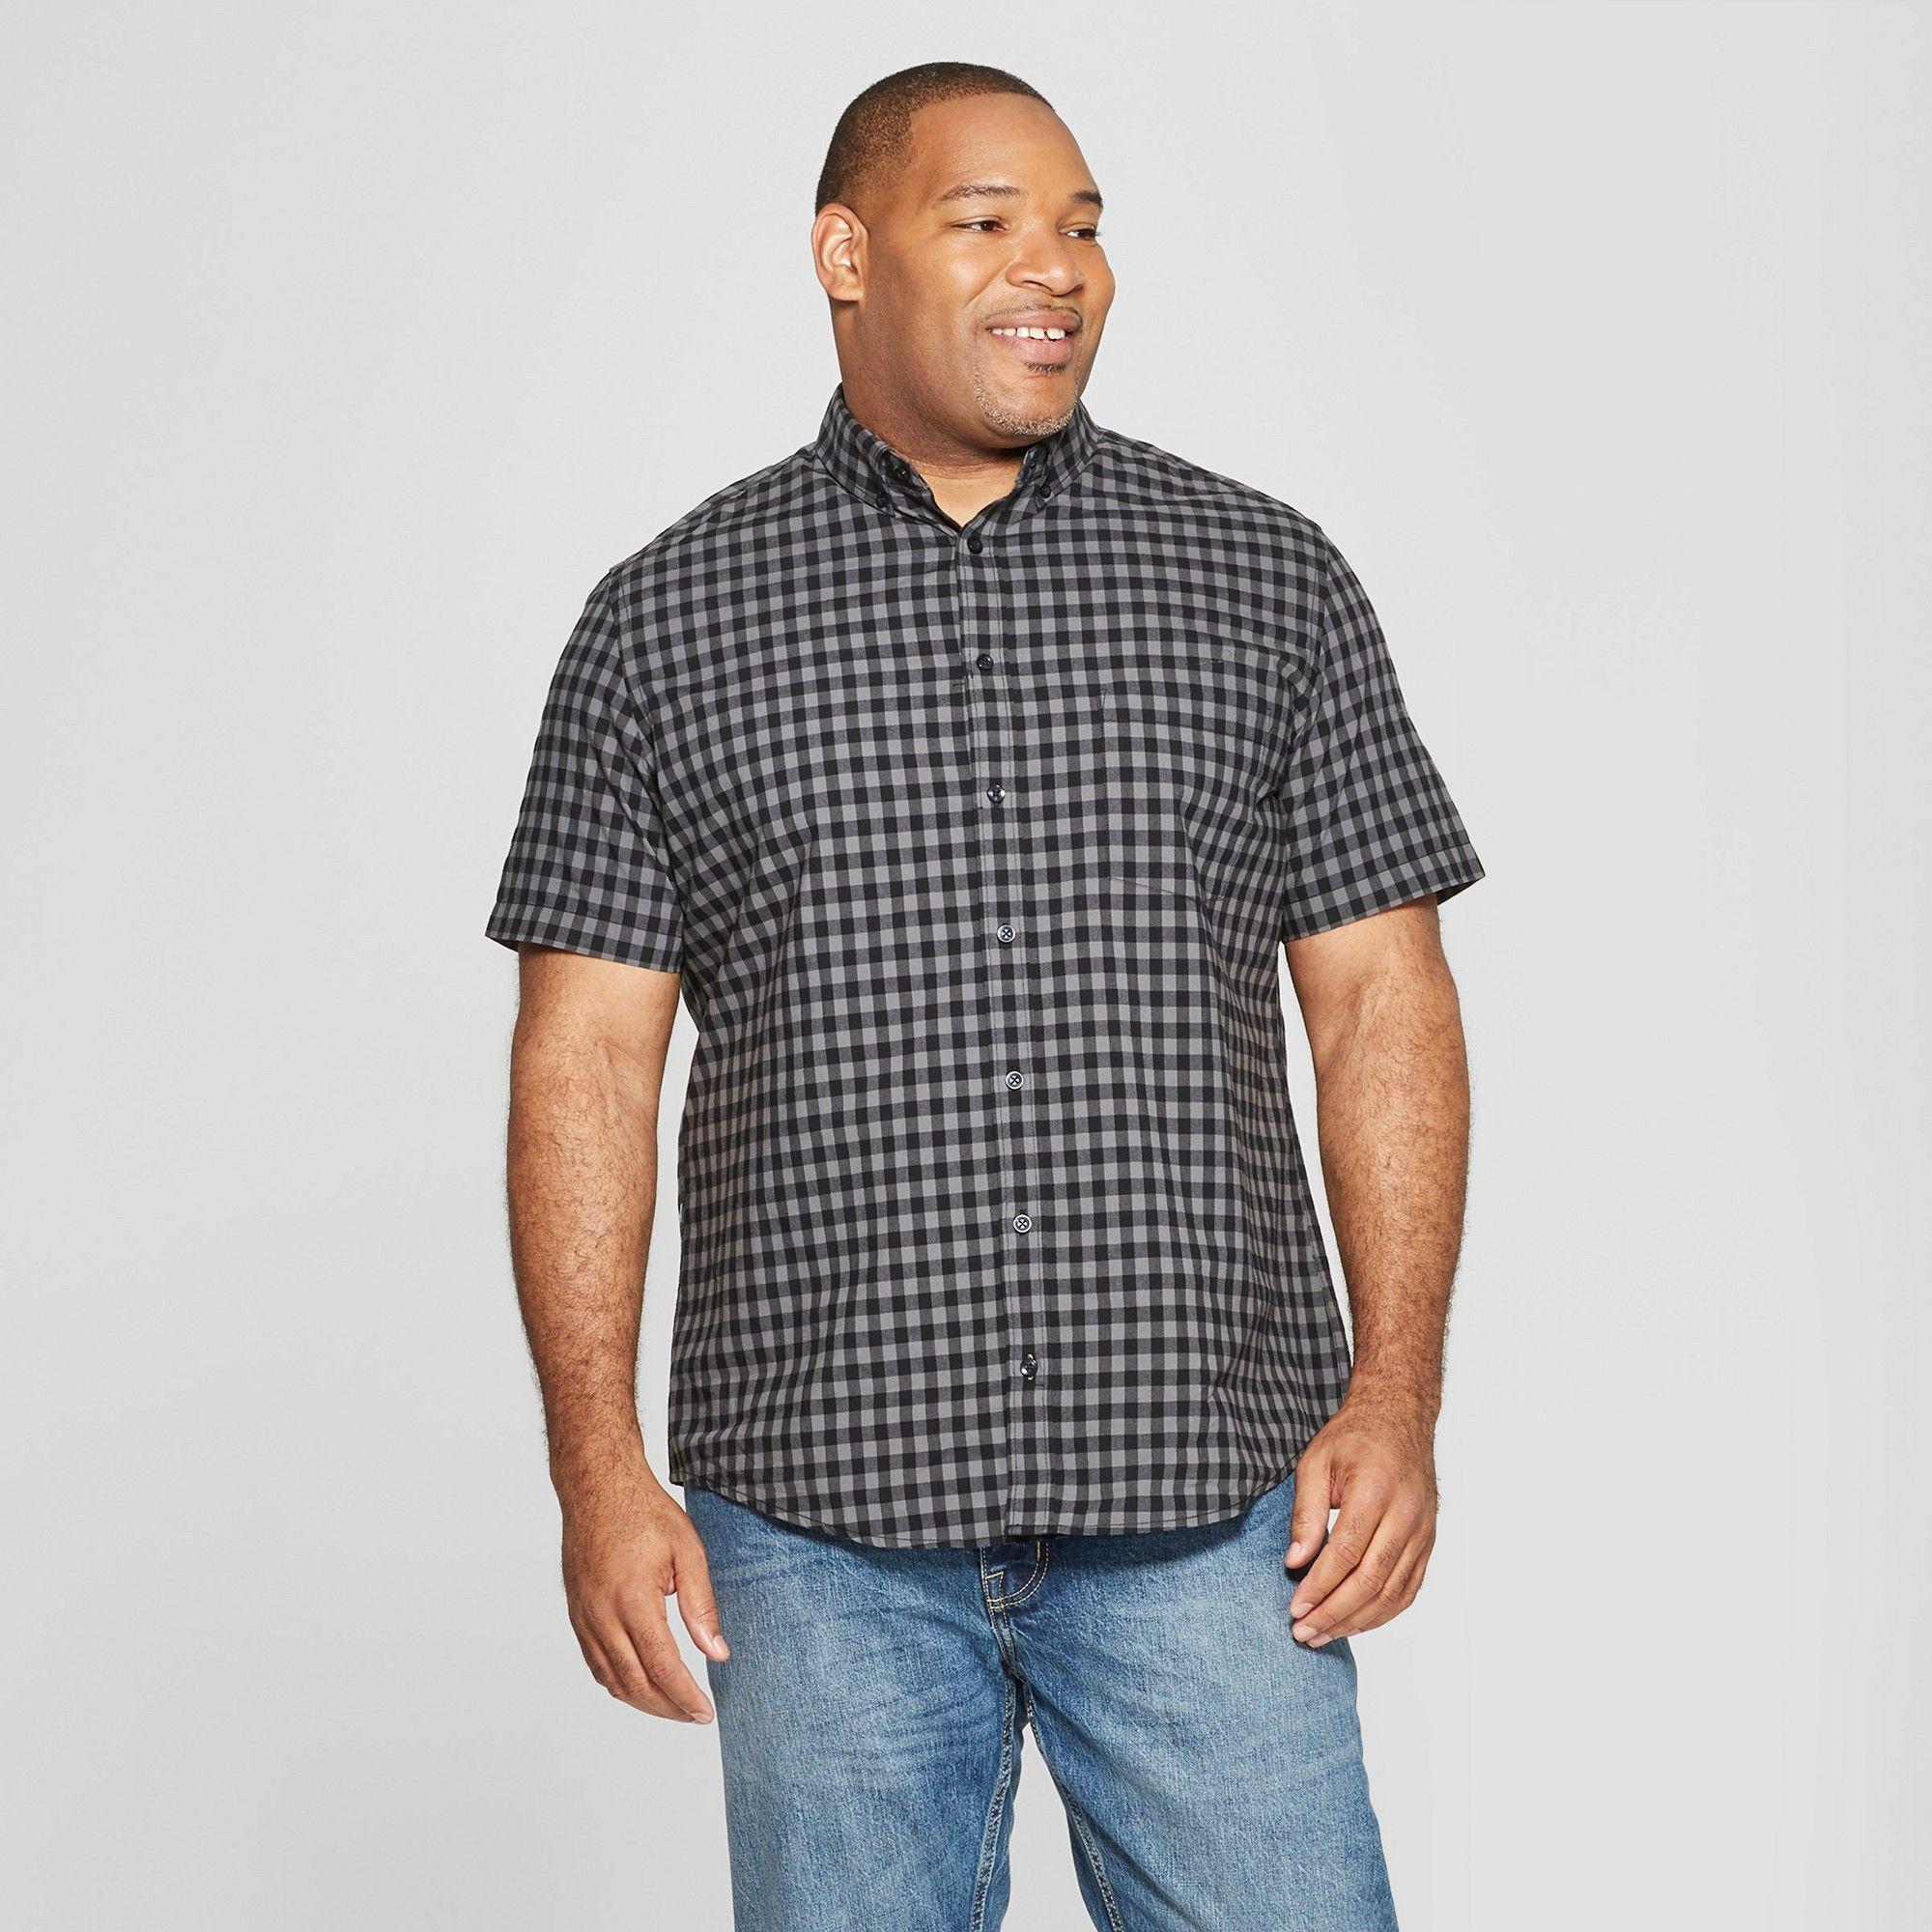 0fb1728e Men's Tall Plaid Standard Fit Short Sleeve Poplin Button-Down Shirt -  Goodfellow & Co Charcoal MT, Gray